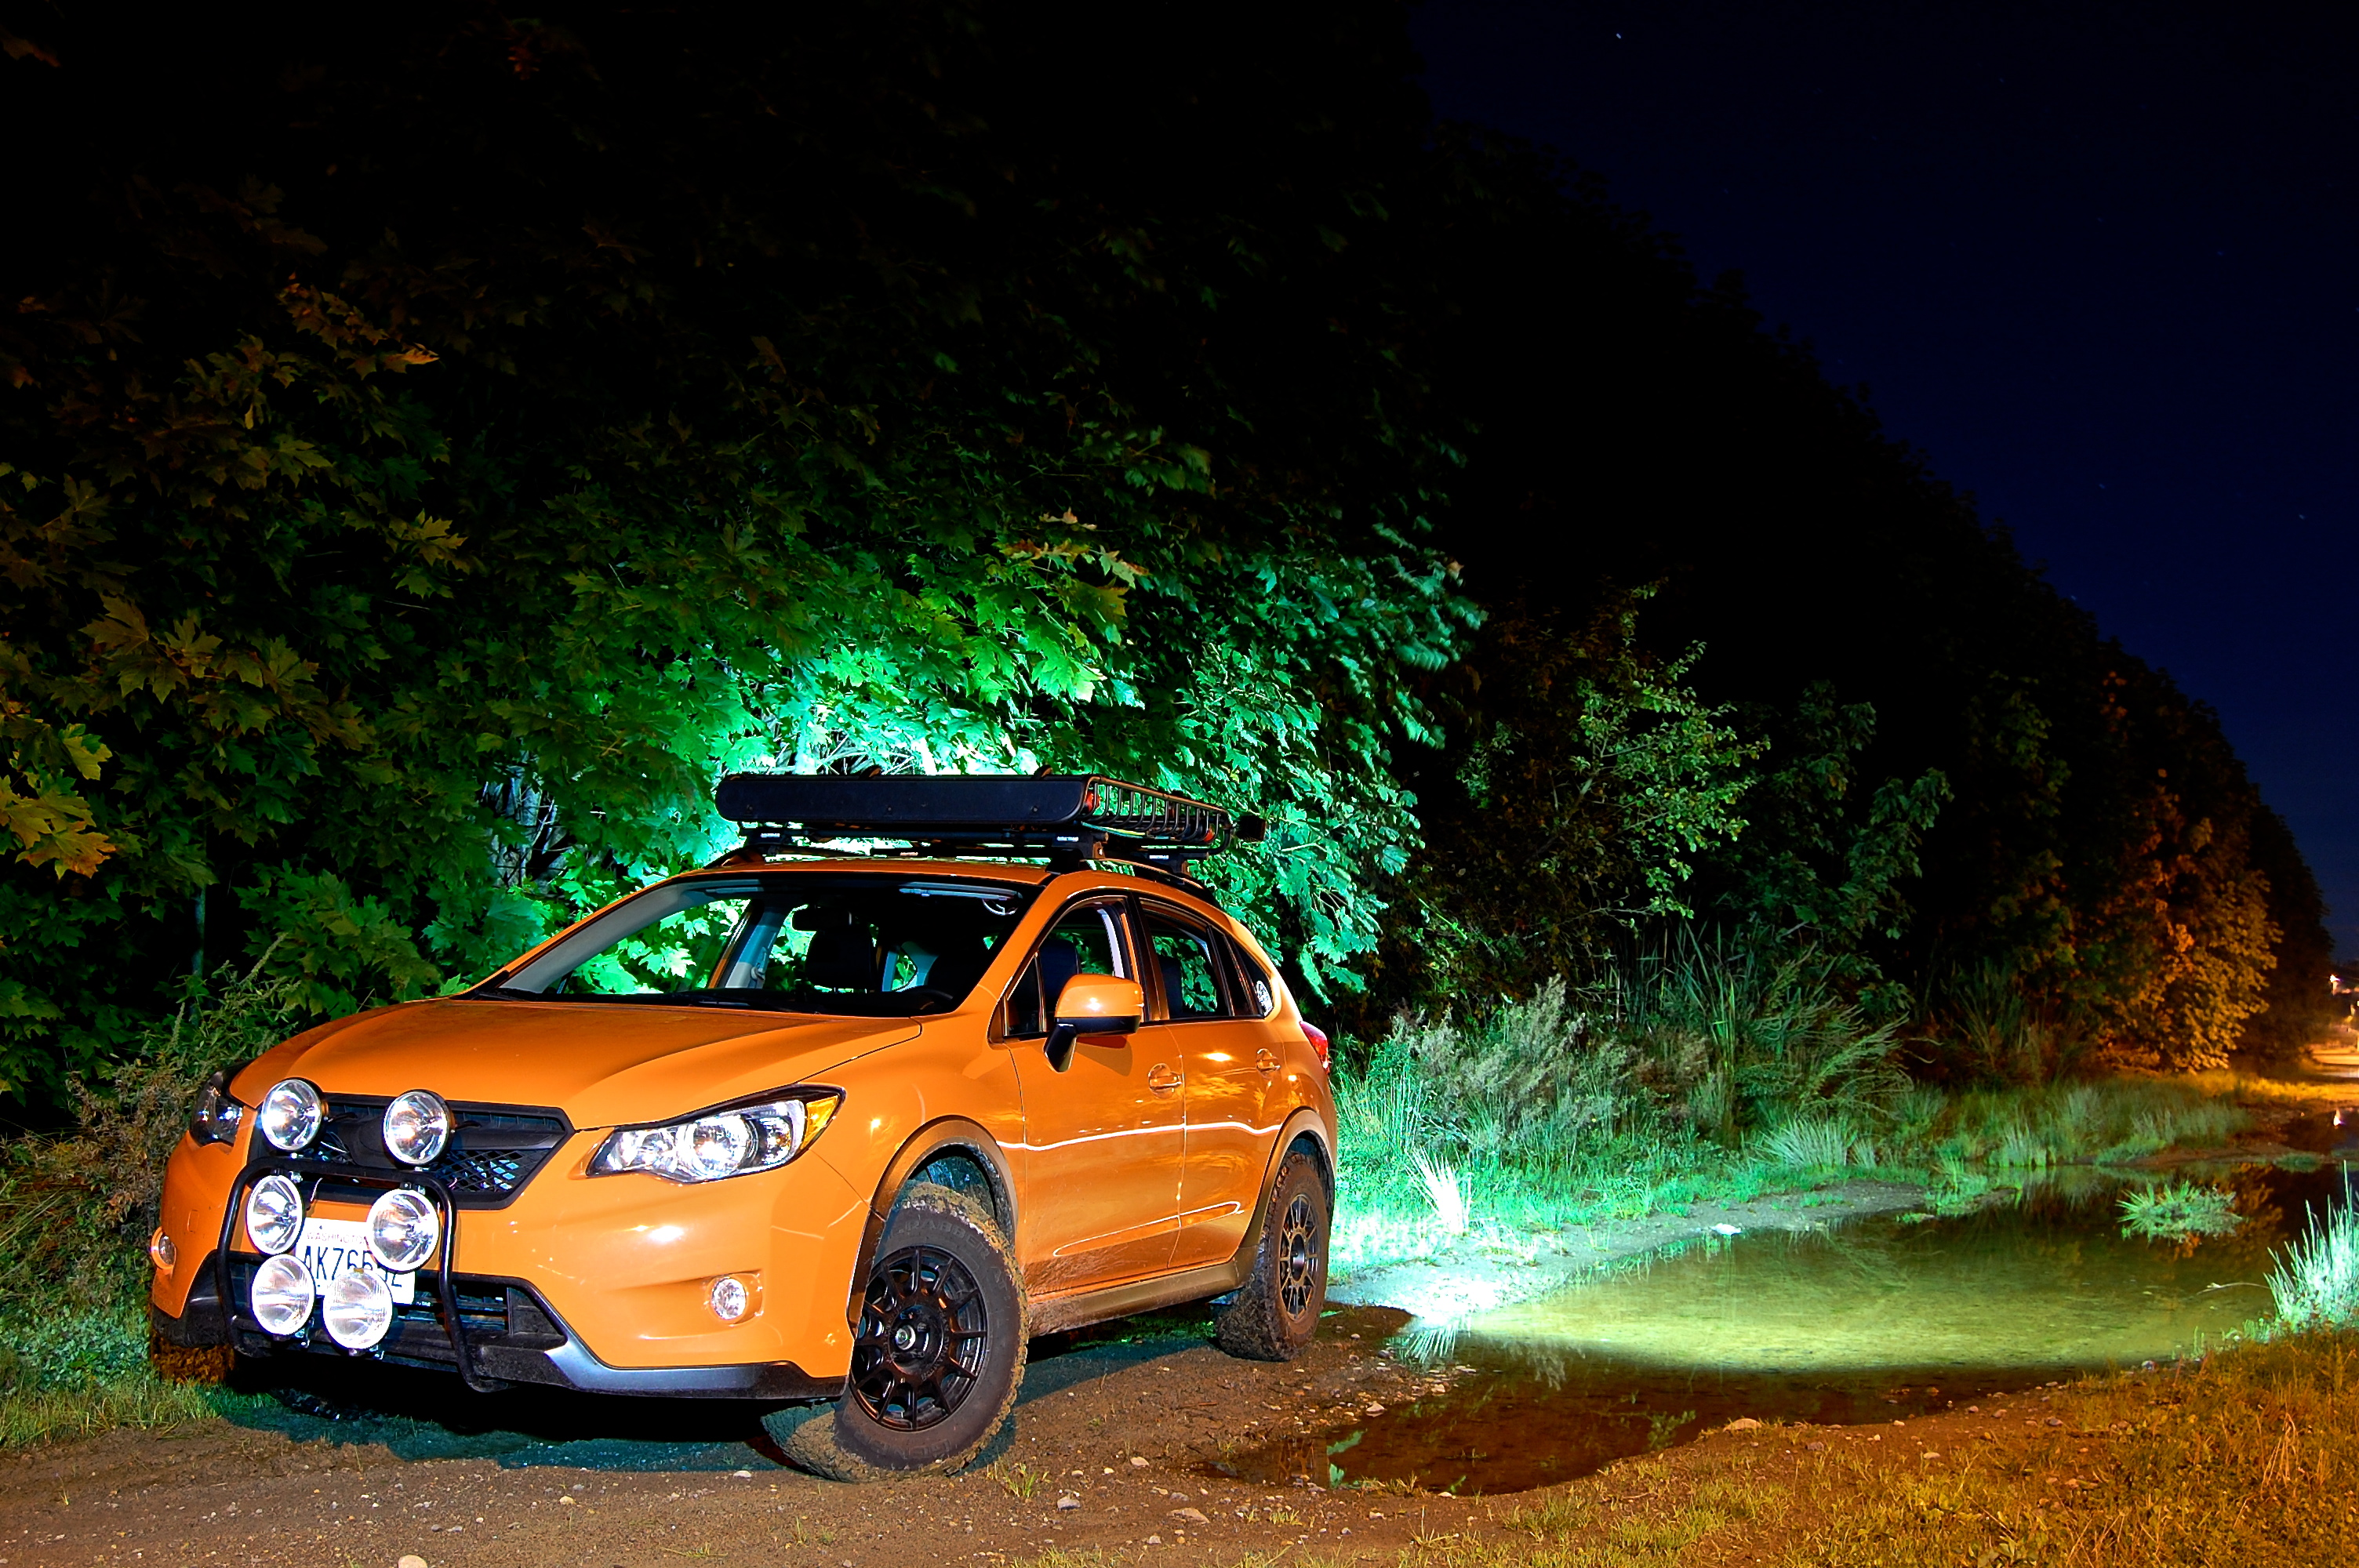 Subie_Noob_Brian here with a RallyX XV Crosstrek!